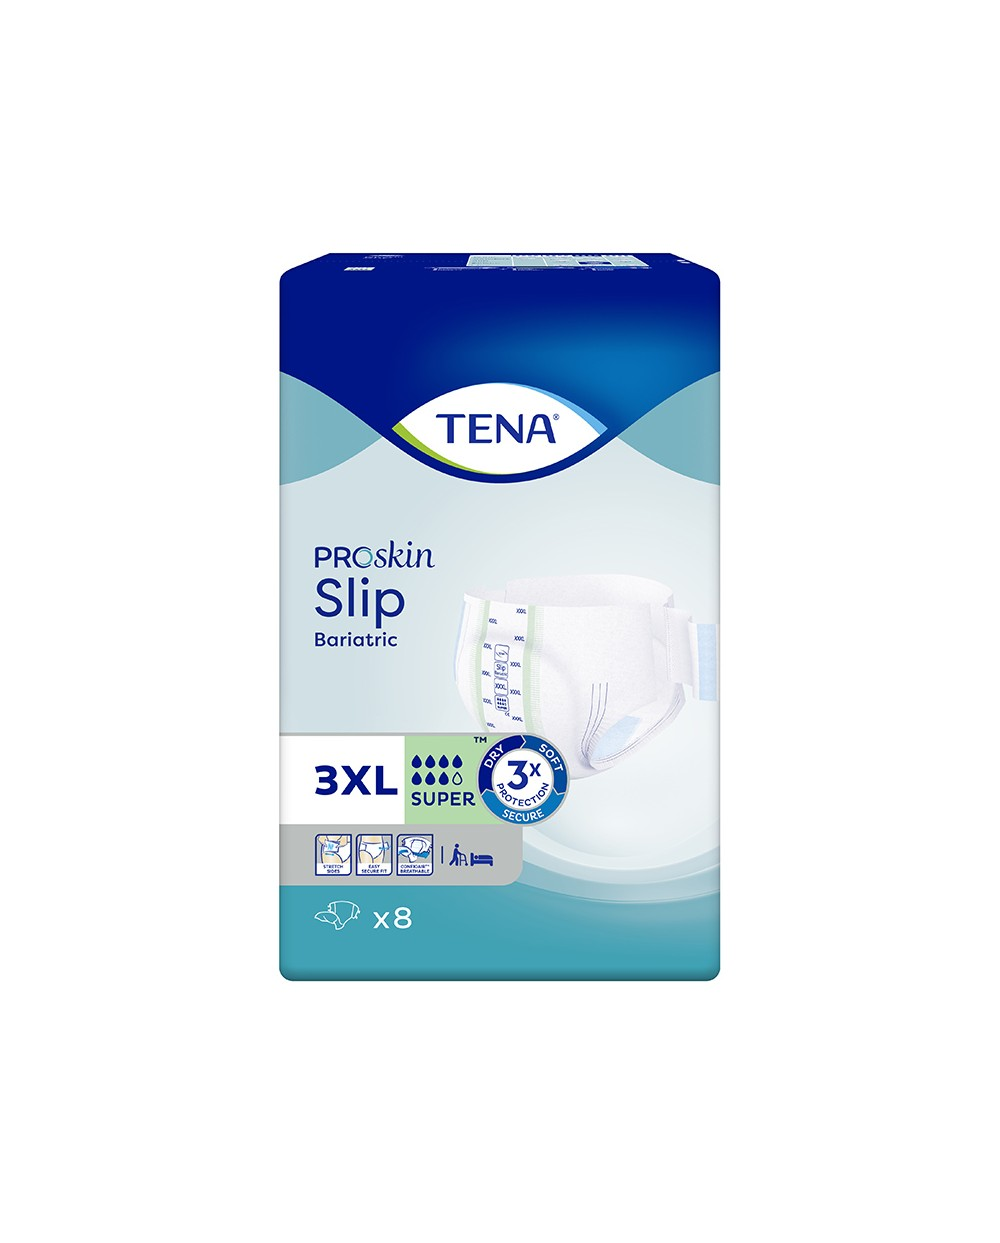 Tena Slip Bariatric Super XXXL - 8 protections